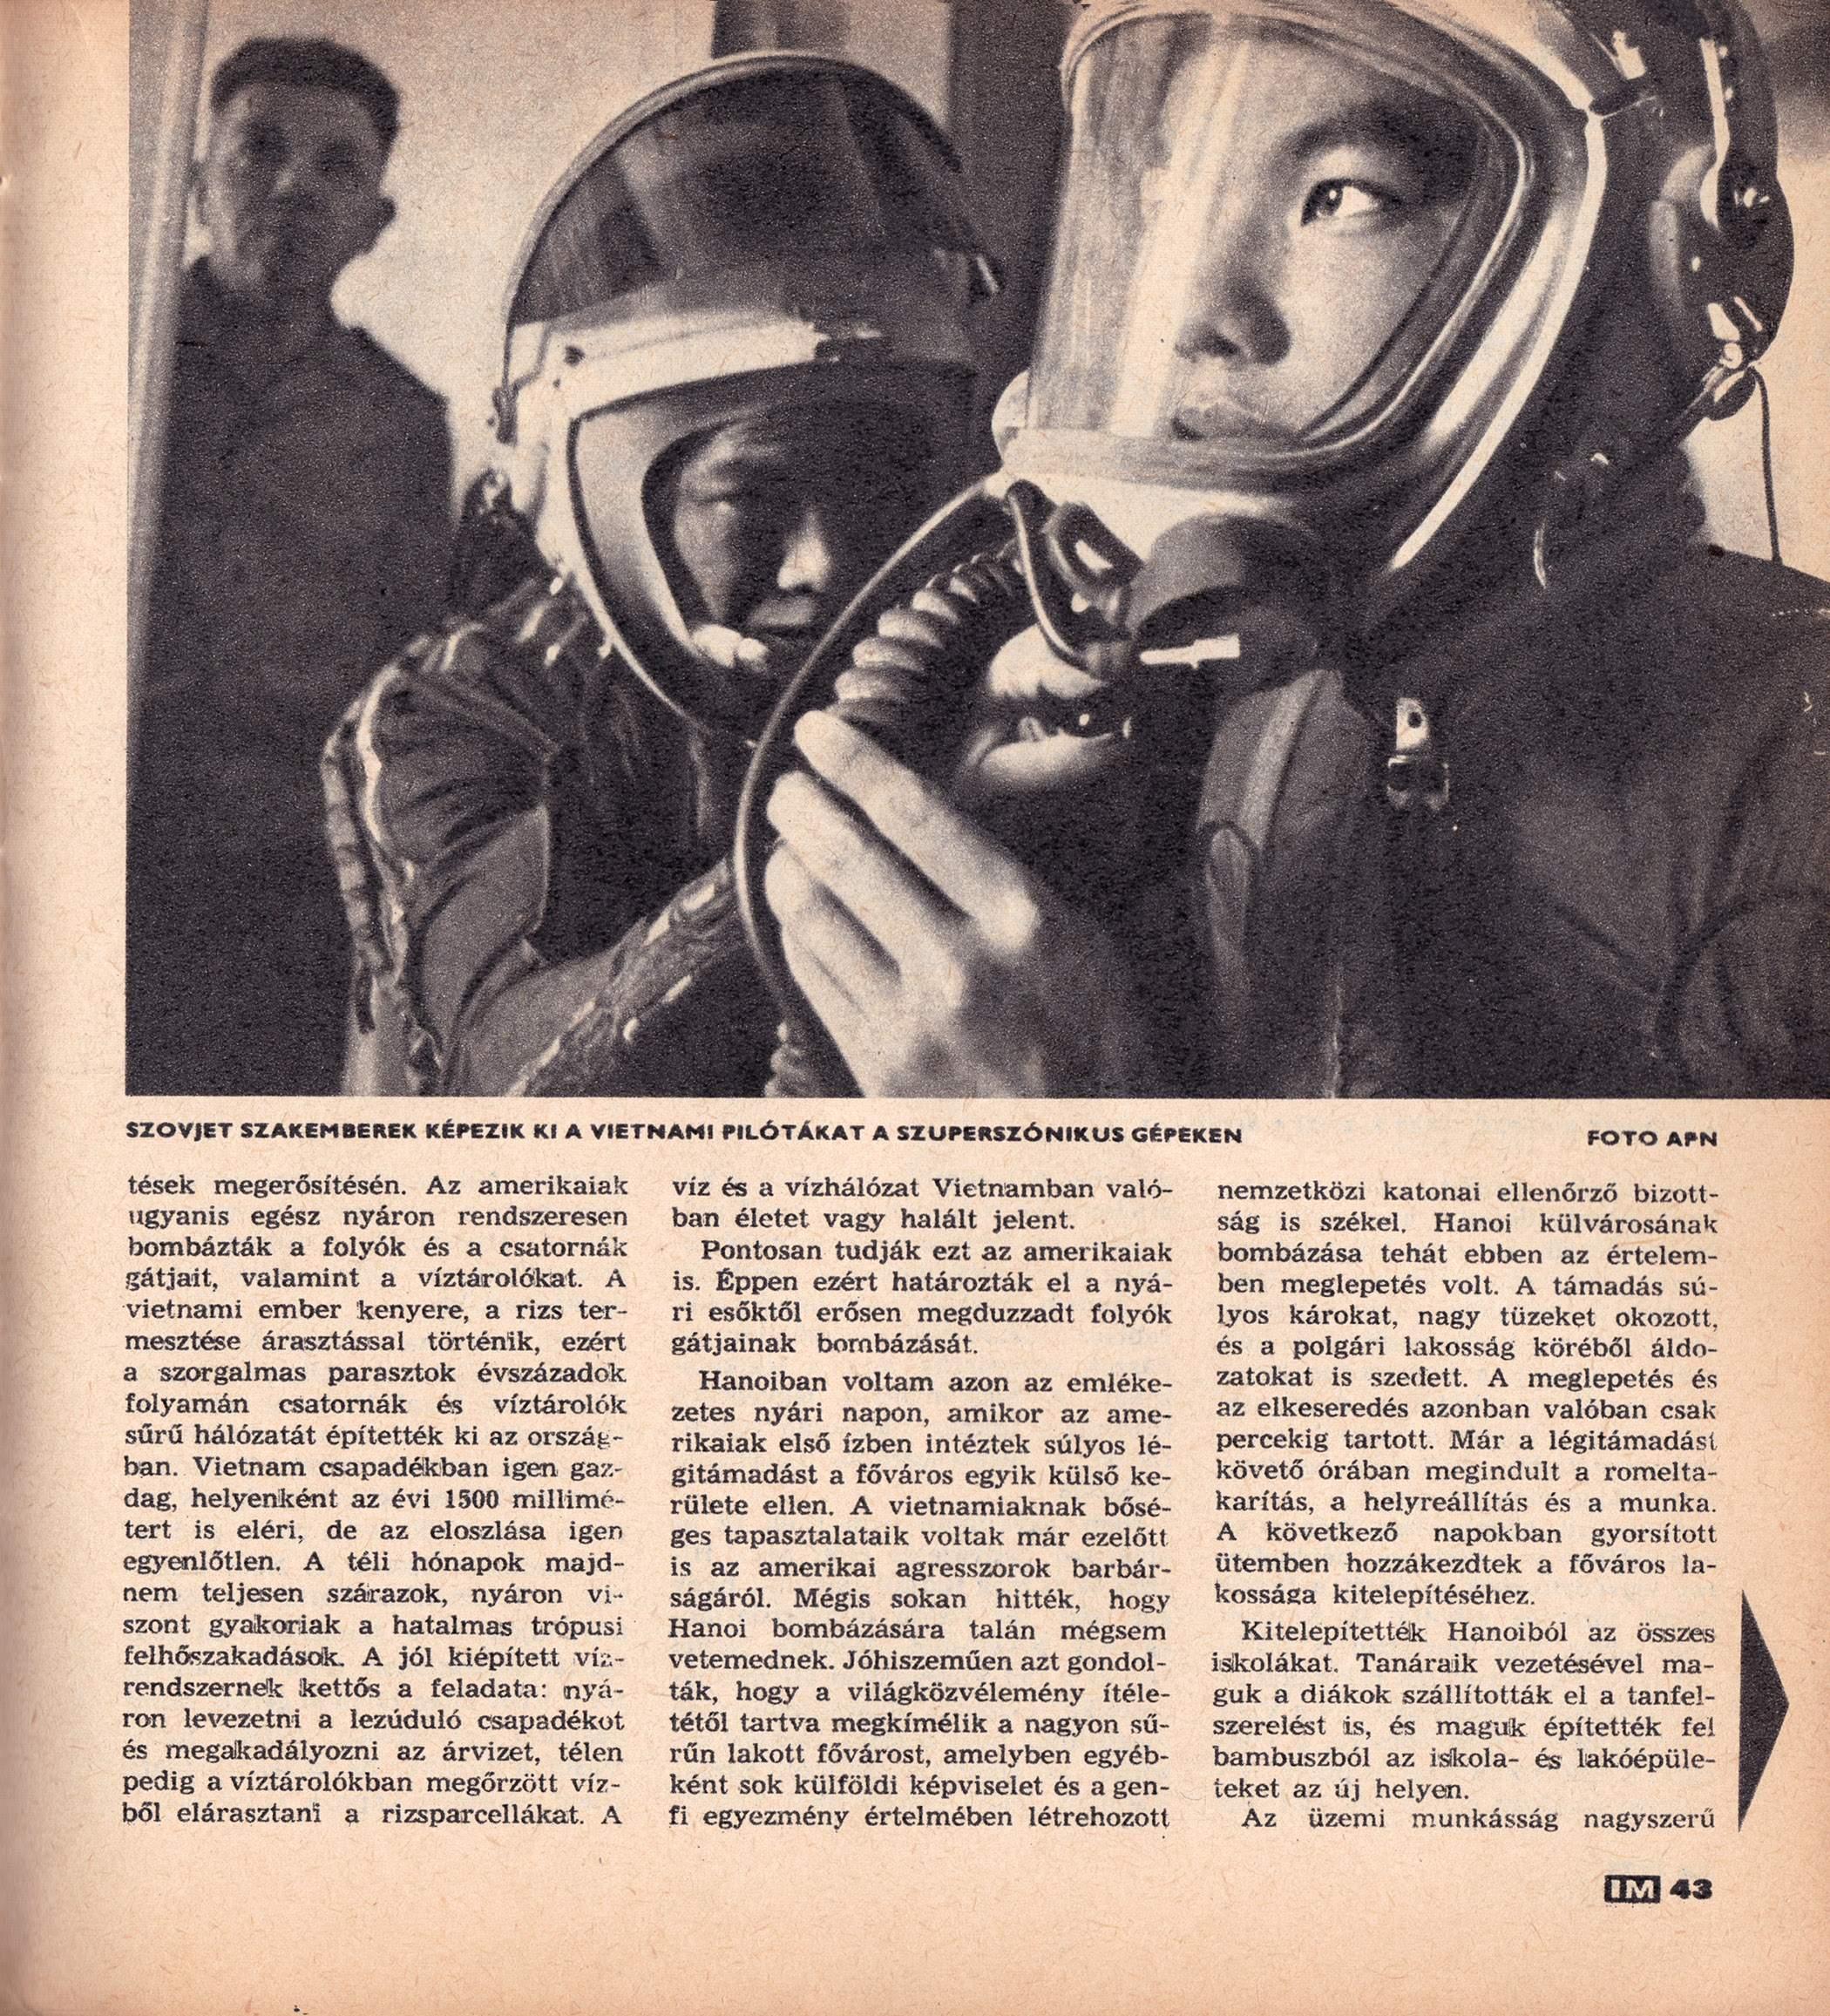 im-cikk-196612_amit_nem_lehet_titkolni_2-.jpg